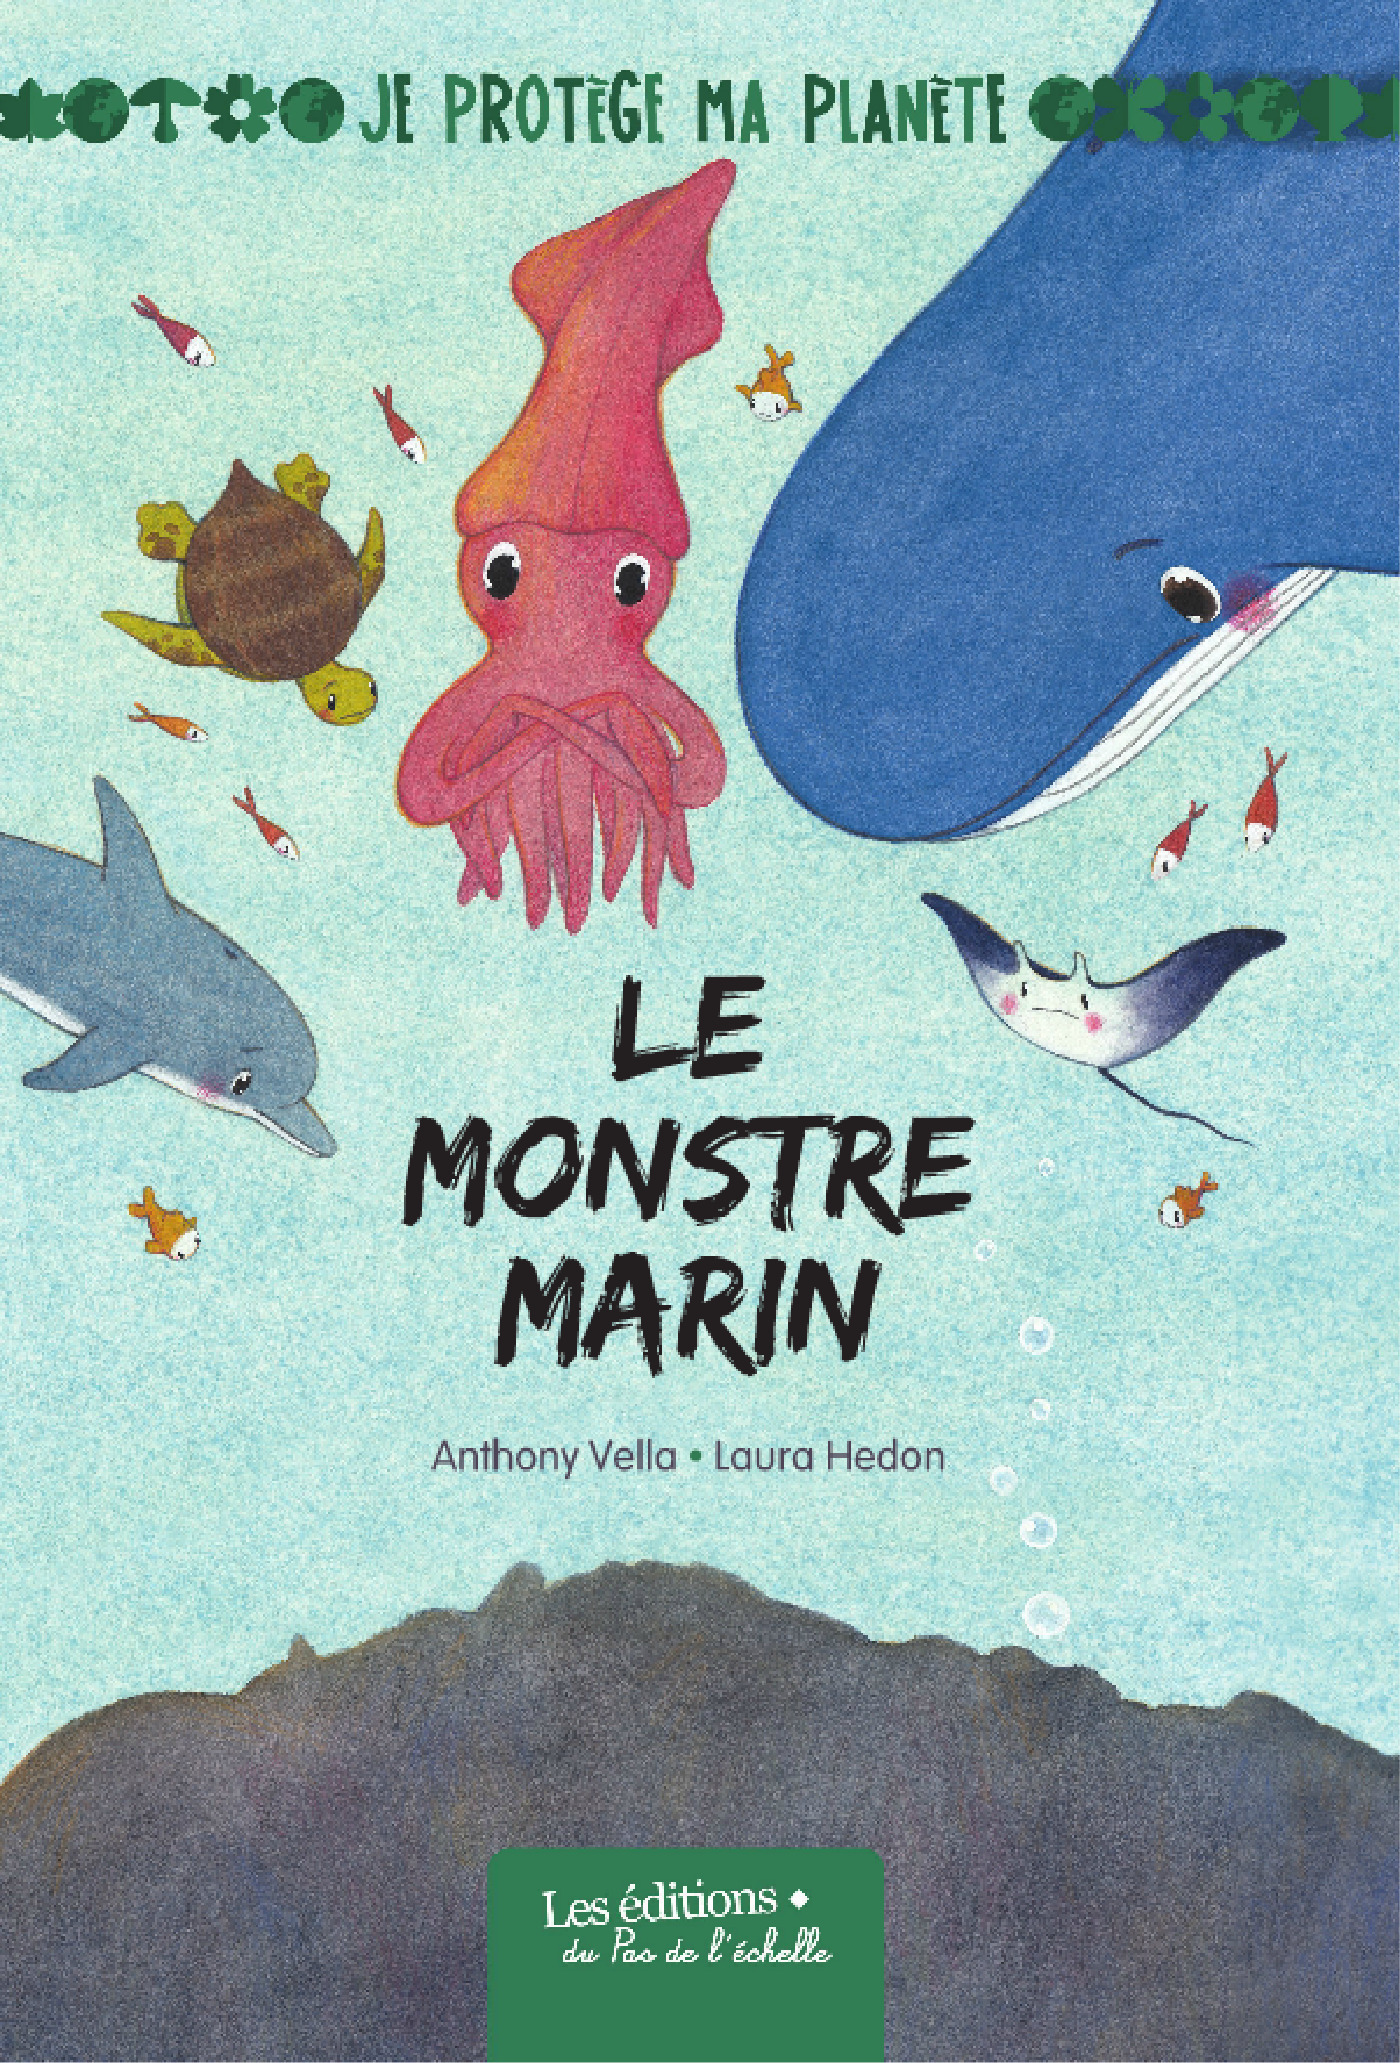 Le monstre marin